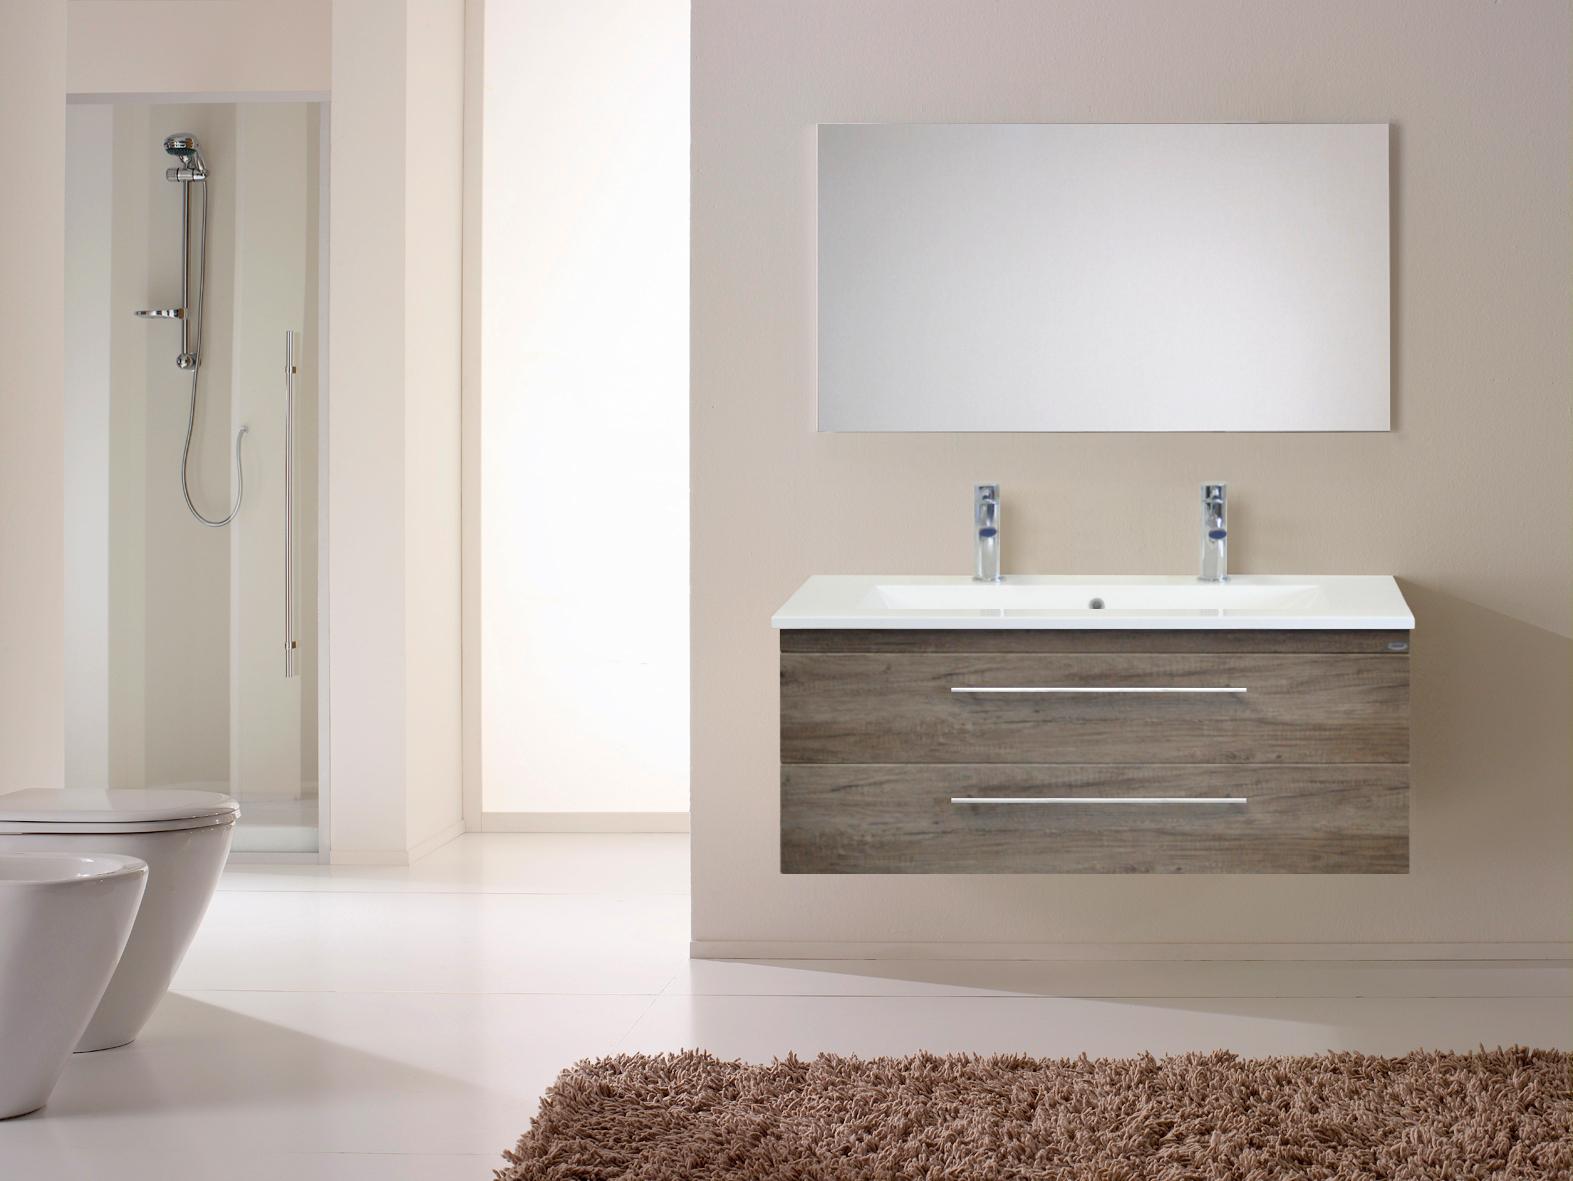 Badkamermeubelset Sanicare Q15 2 Laden Hoogglans Wit (spiegel optioneel)